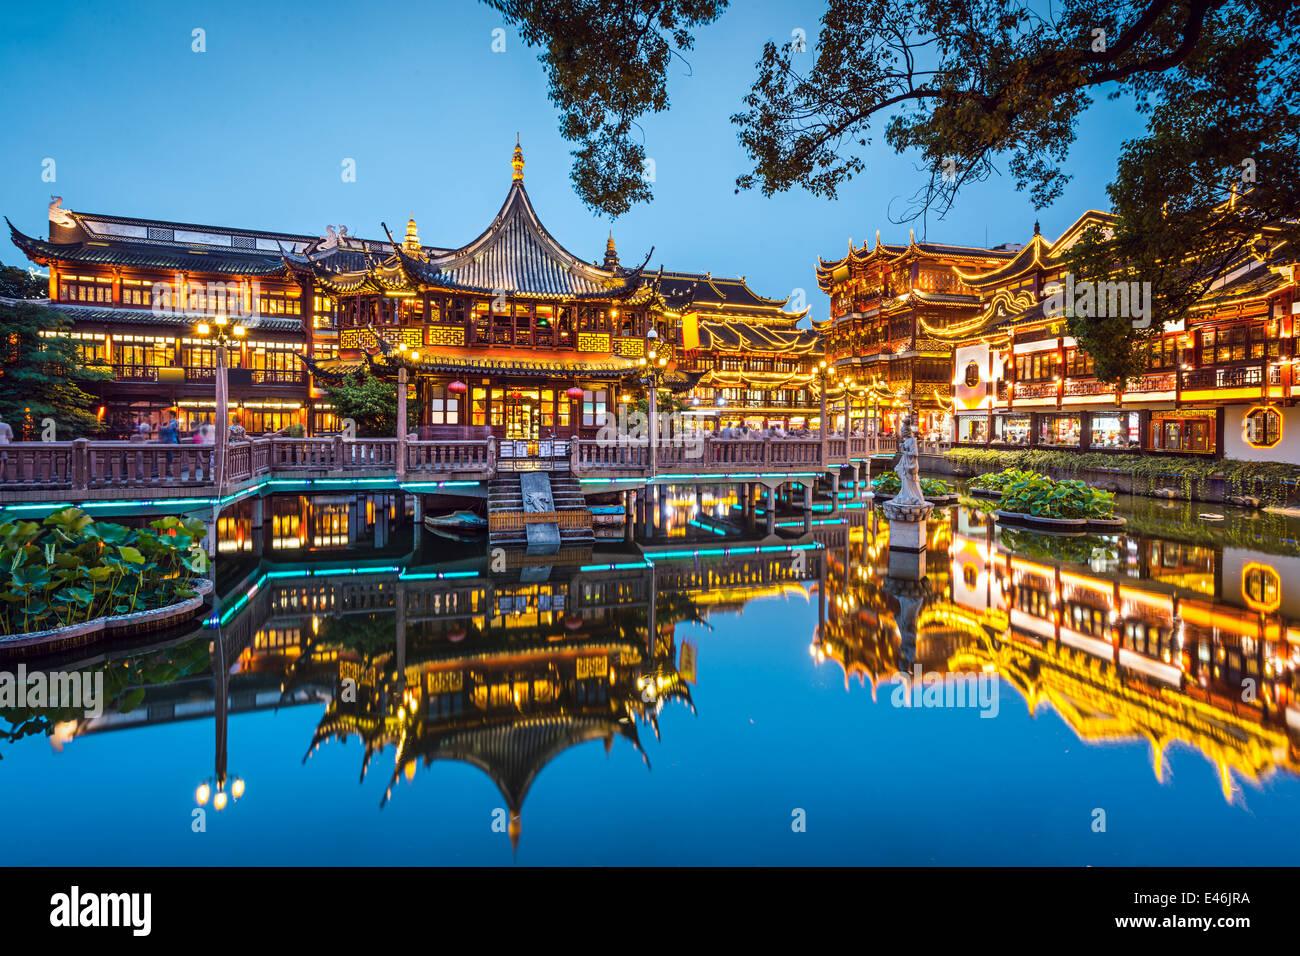 Shanghai, China en el jardín Yuyuan. Imagen De Stock